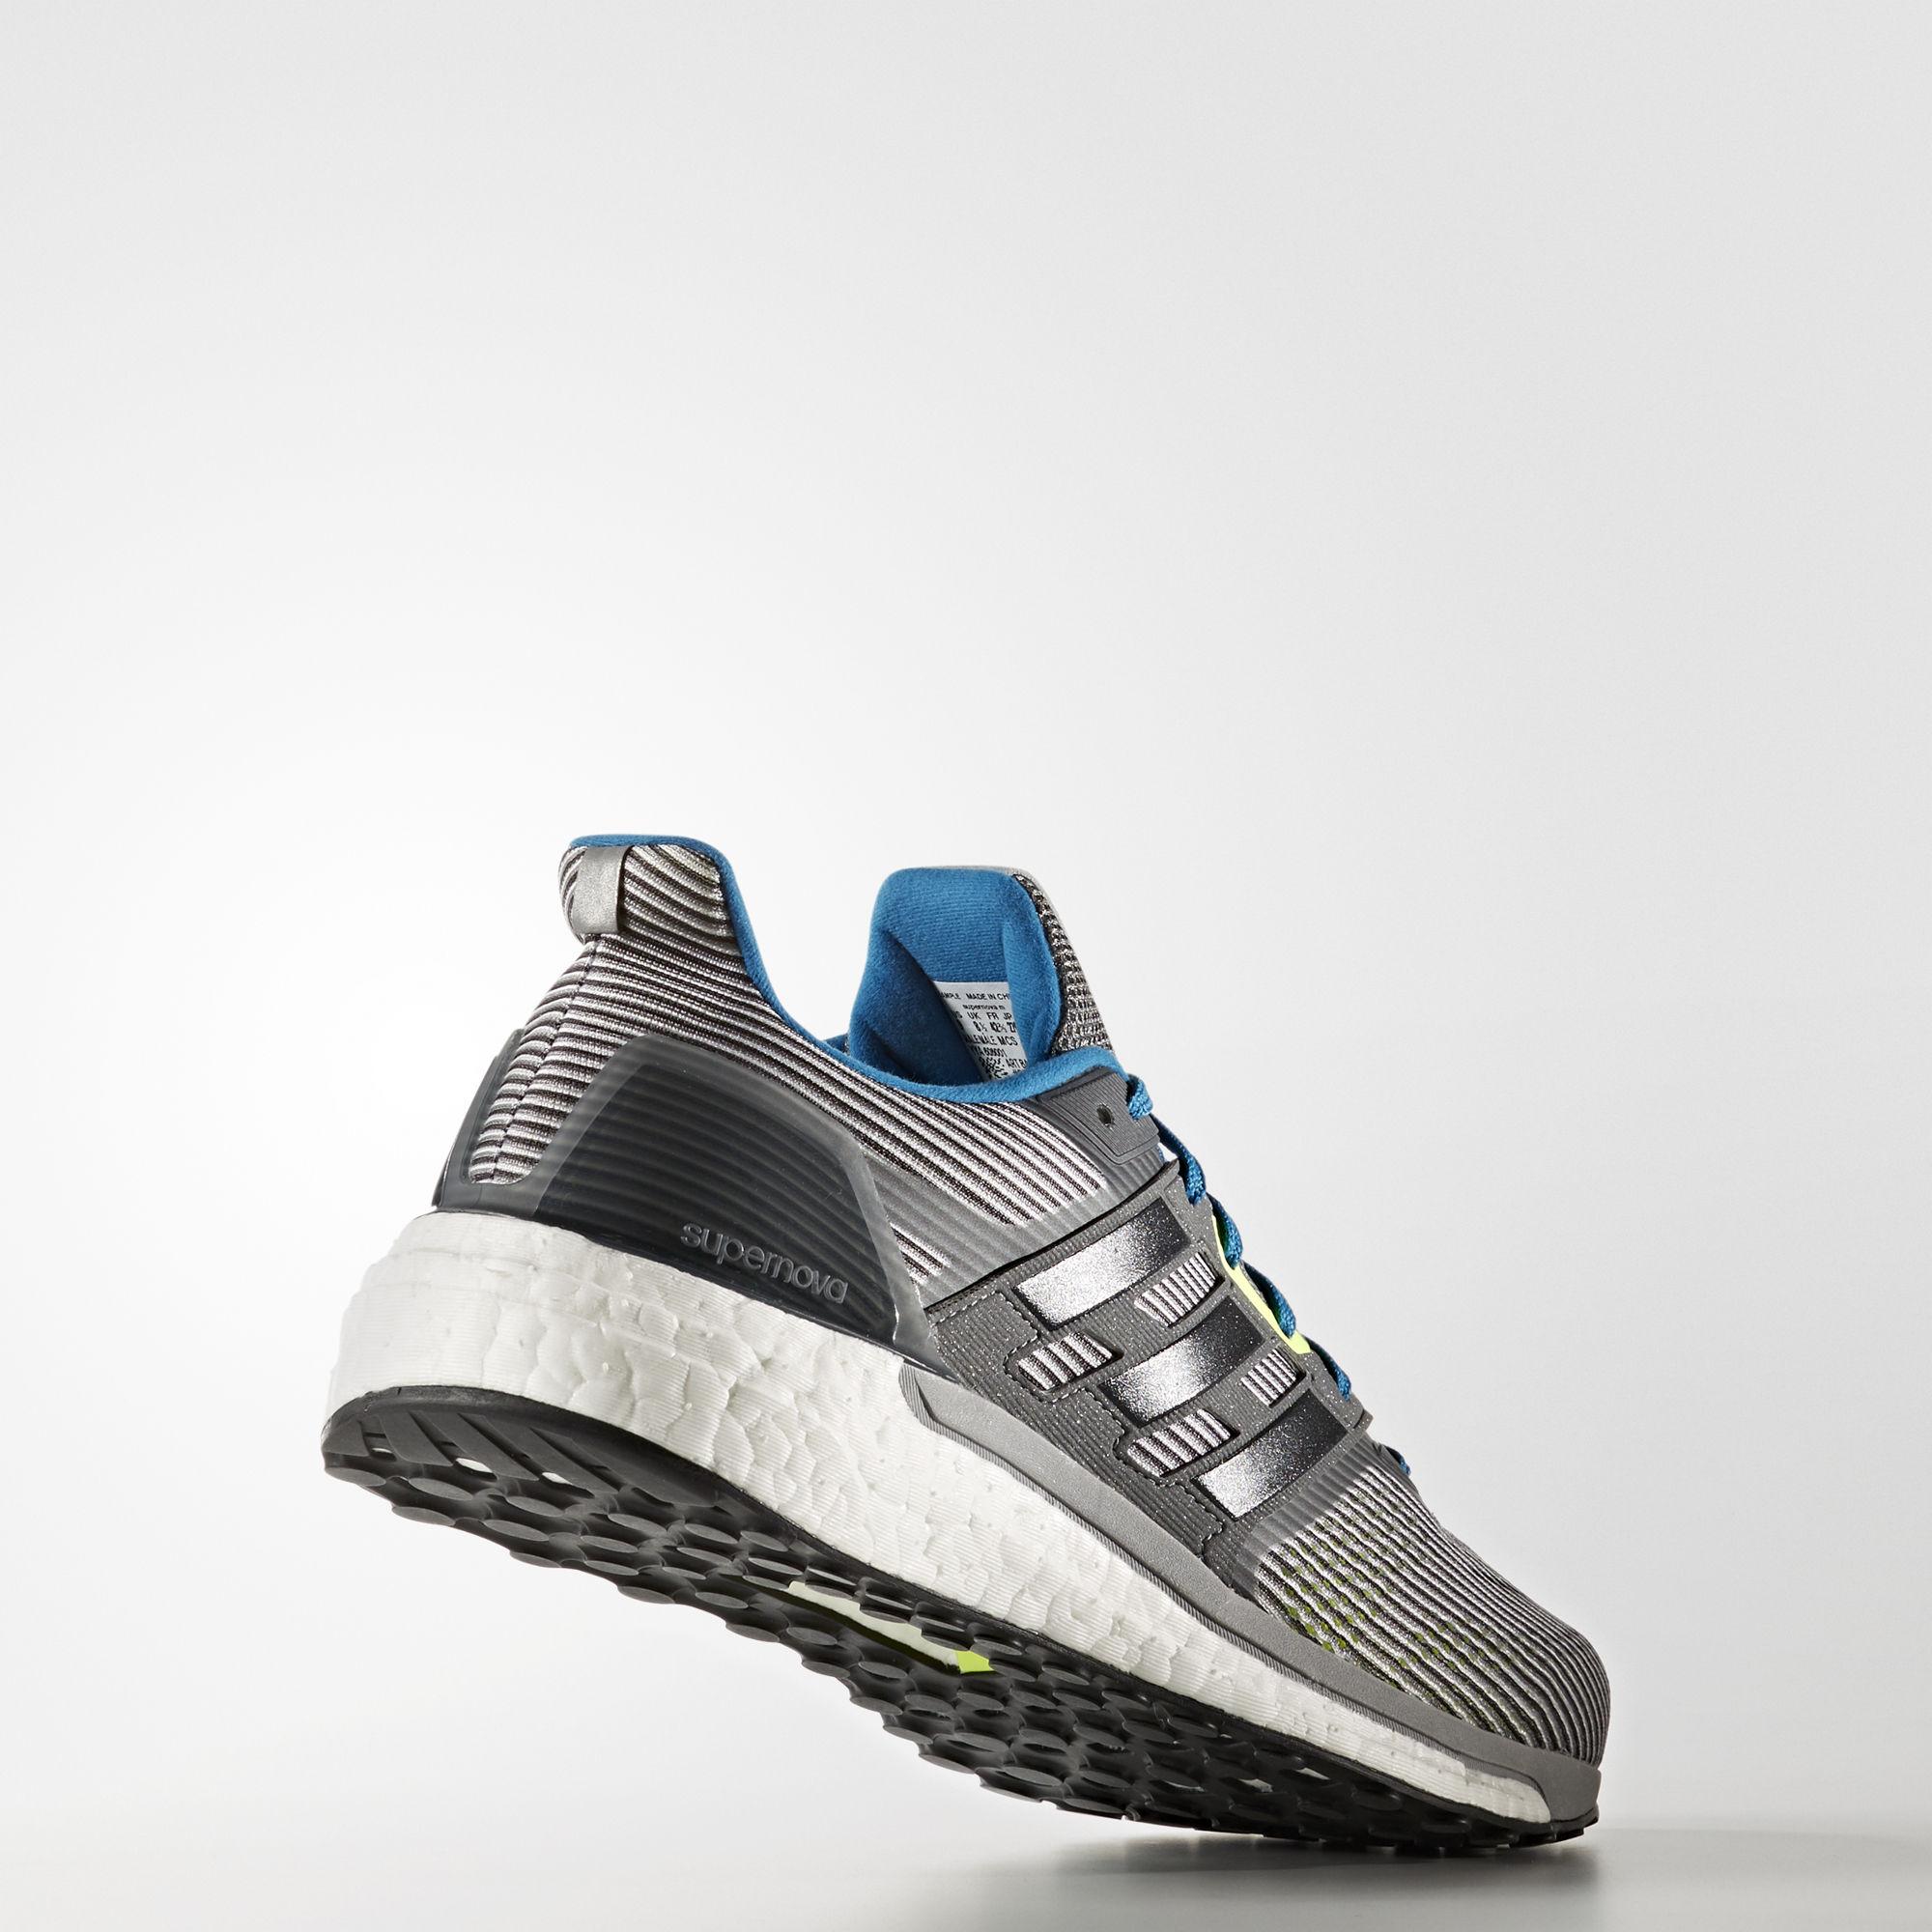 adidas Supernova in Vista Grey